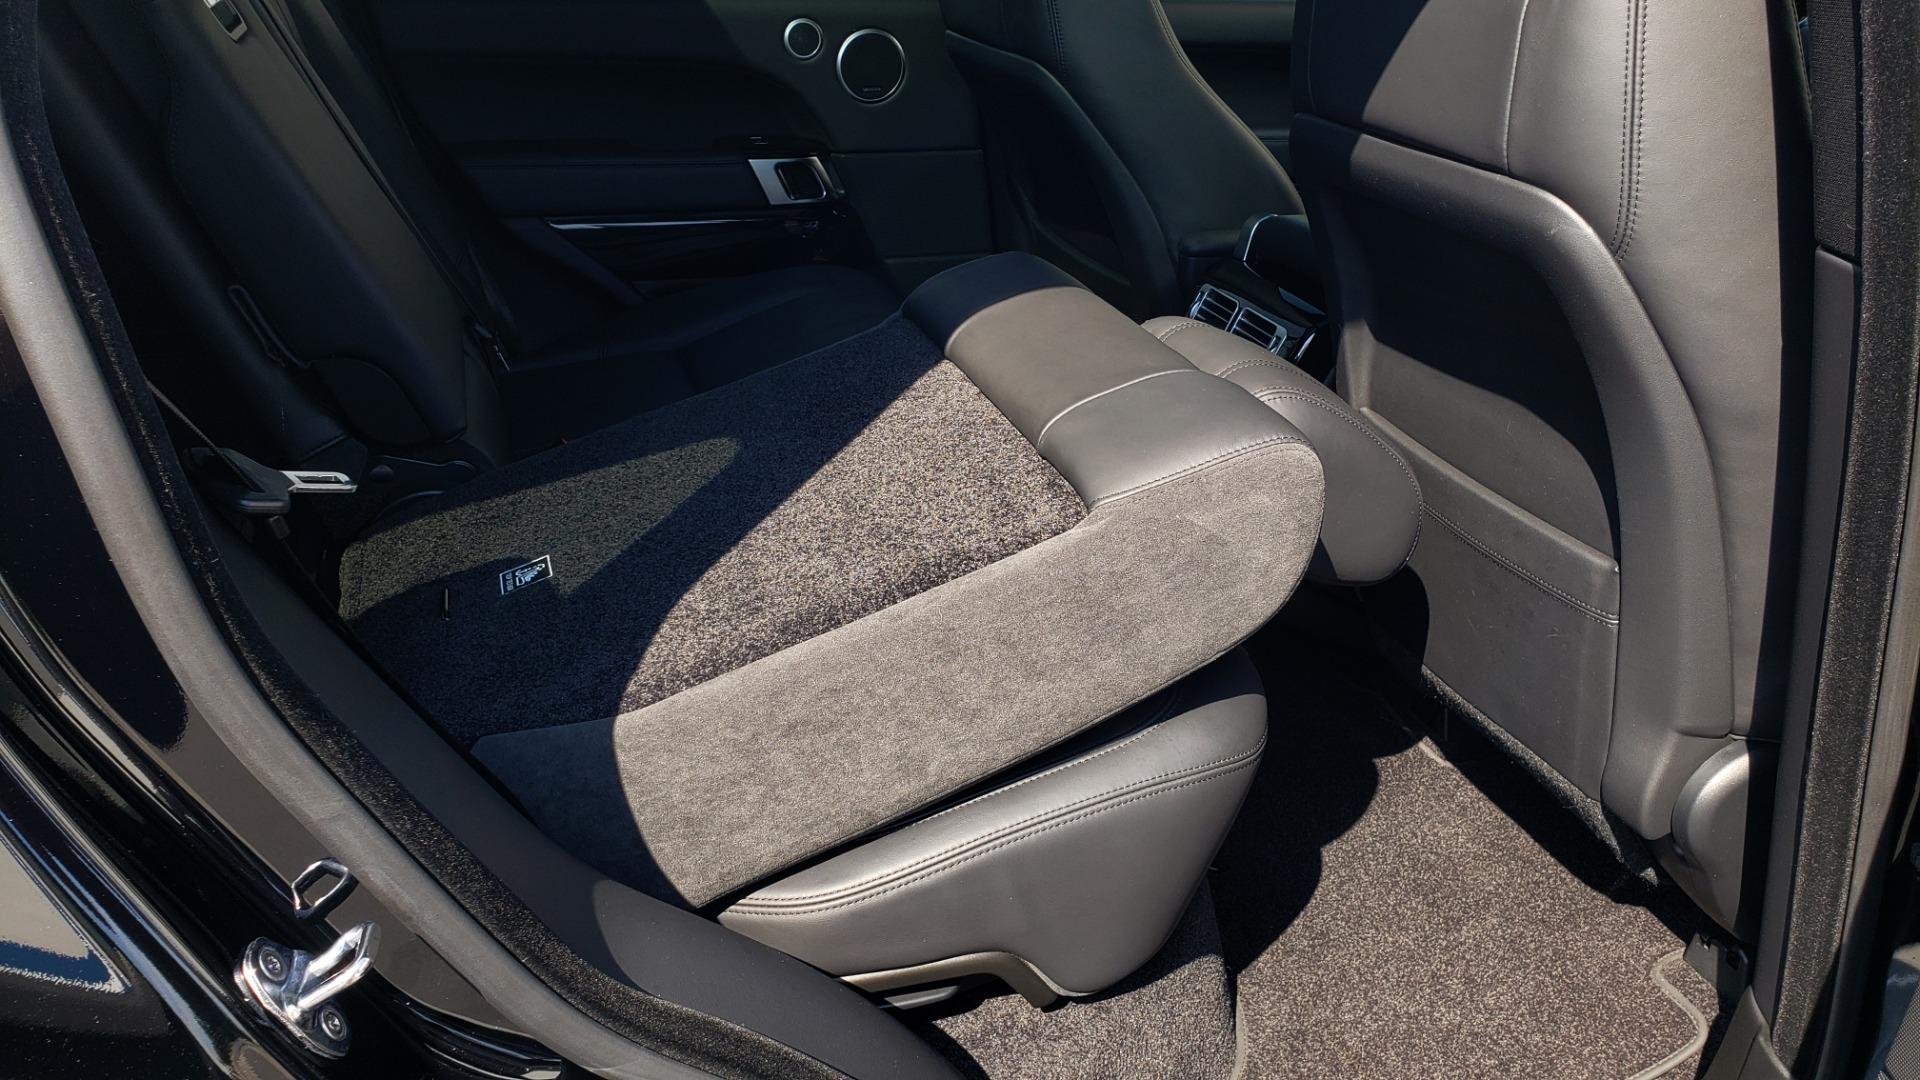 Used 2017 Land Rover RANGE ROVER SC V8 / VISION ASST / DRIVE PKG / MERIDIAN SOUND / PANO-ROOF / NAV / BSM for sale $75,995 at Formula Imports in Charlotte NC 28227 81